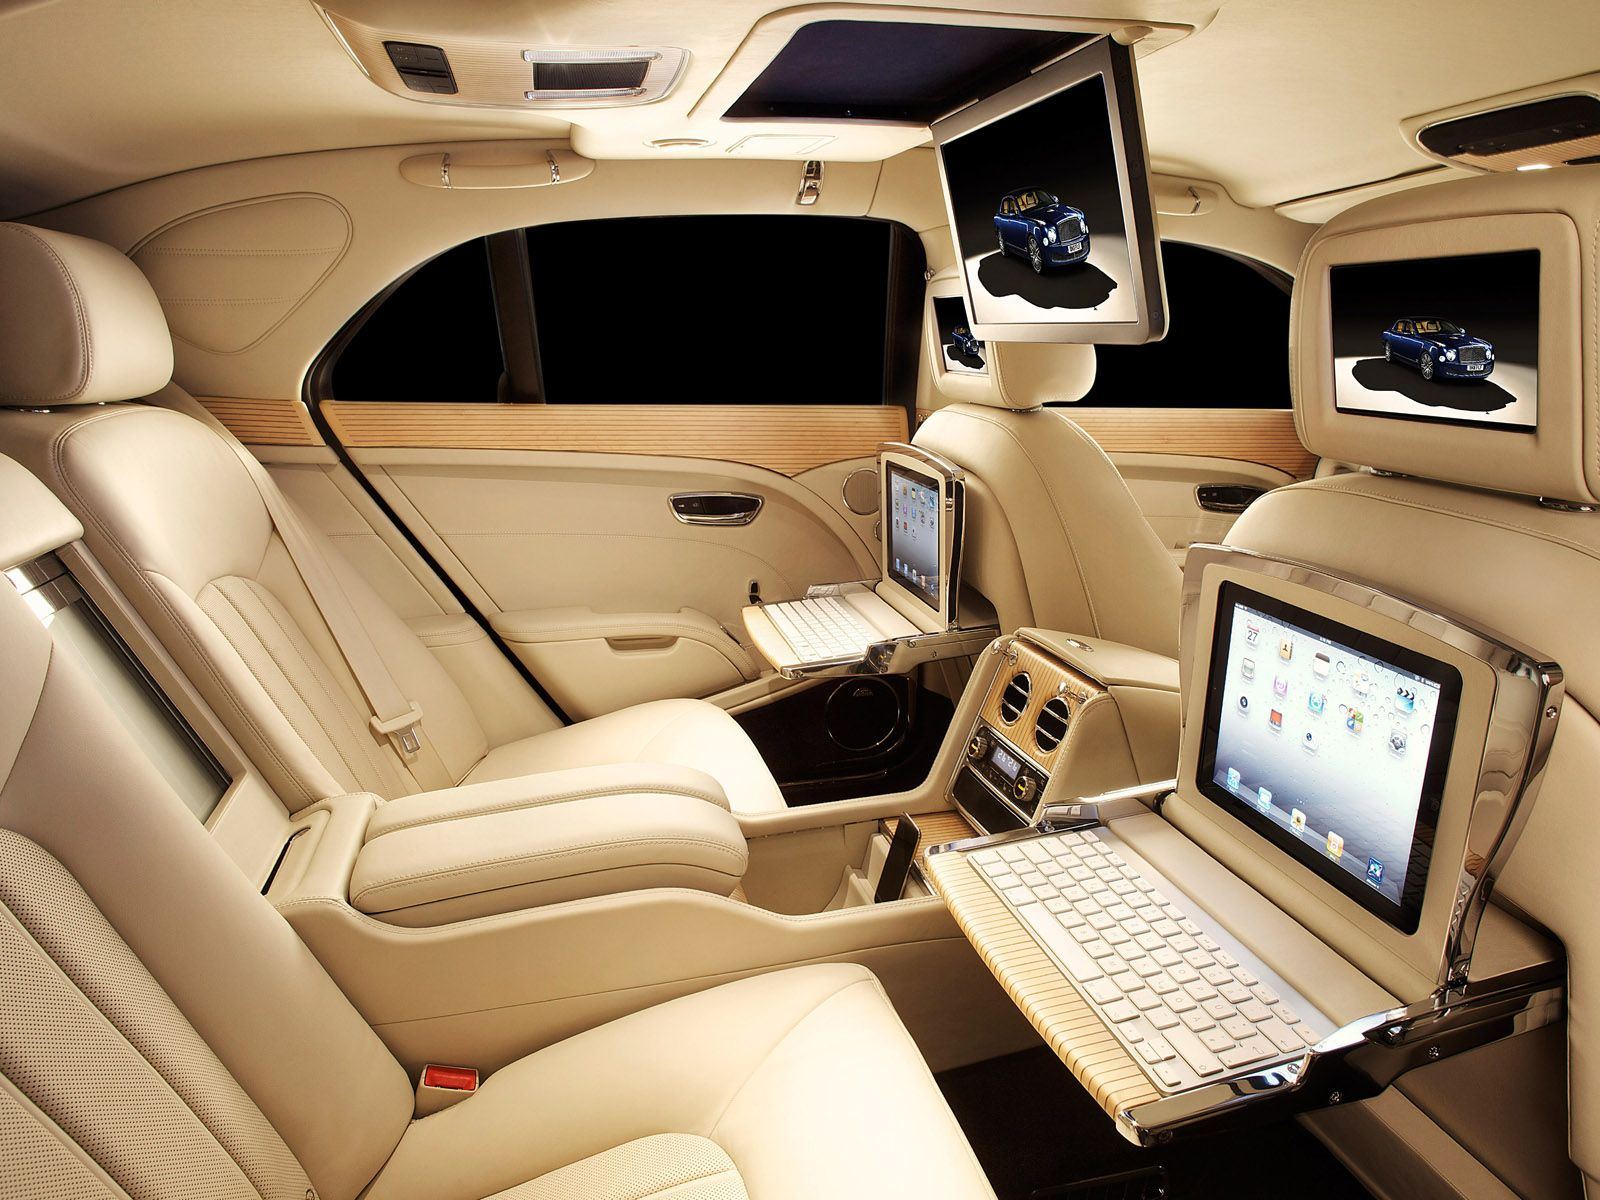 Car interior photos - Best Interior Cars Other Bentley Cars Bentley Mulsanne Sedan Car Exterior And Interior